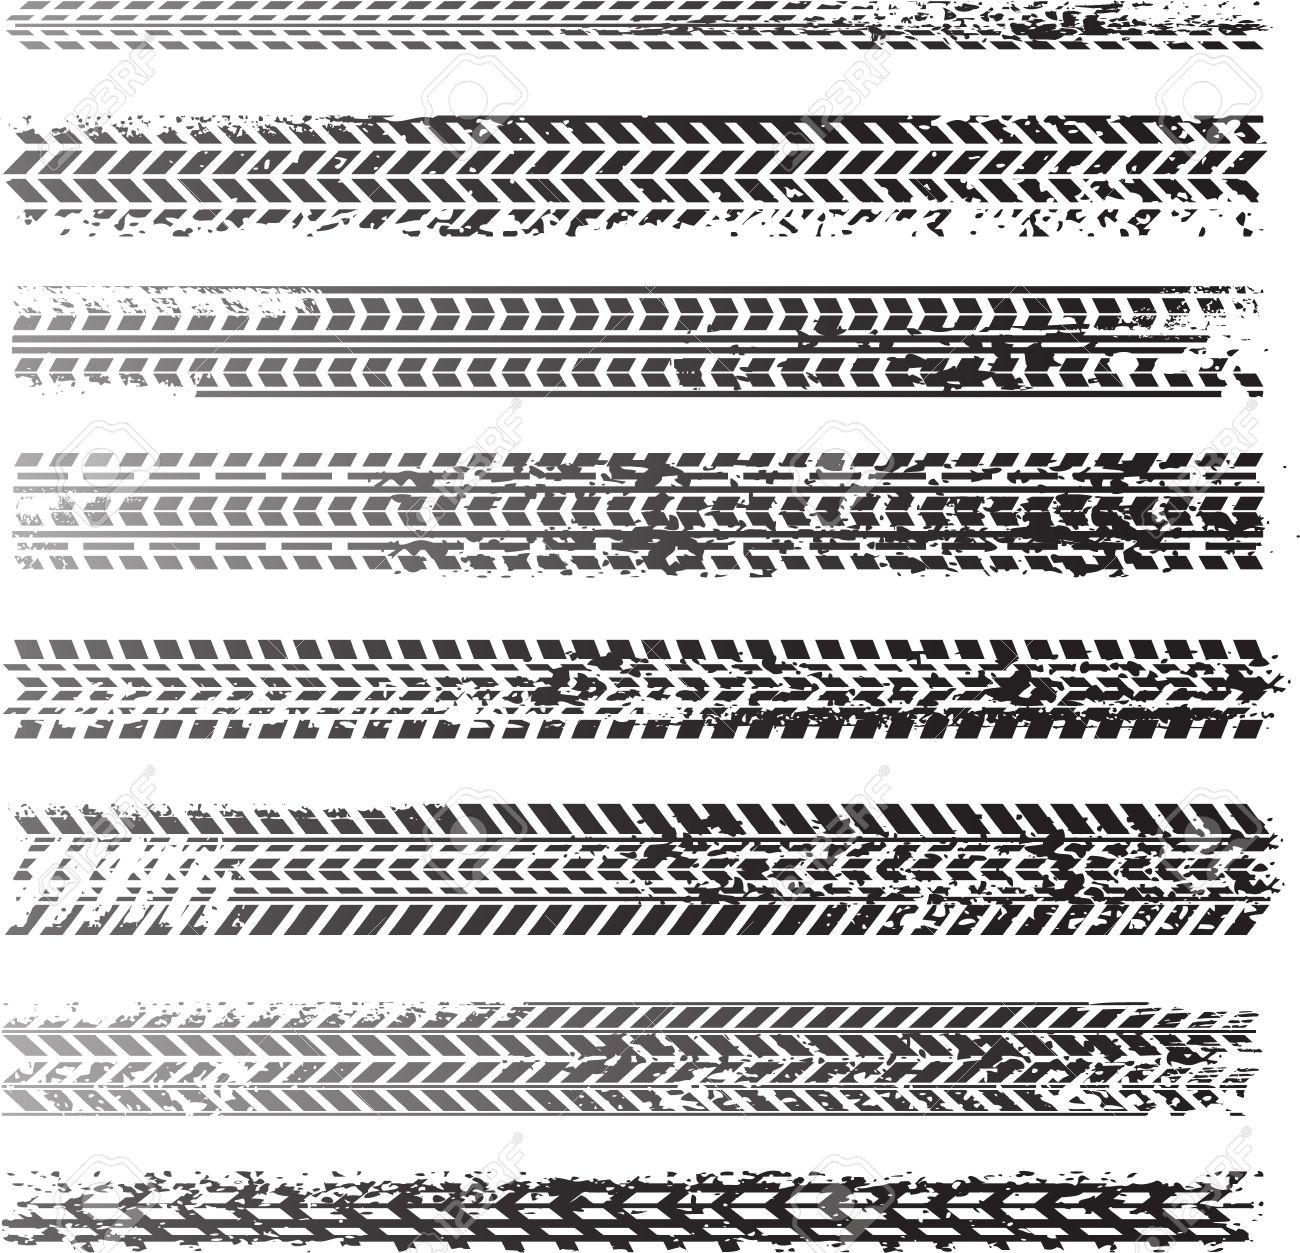 Dirty tire tracks Stock Vector - 17311997